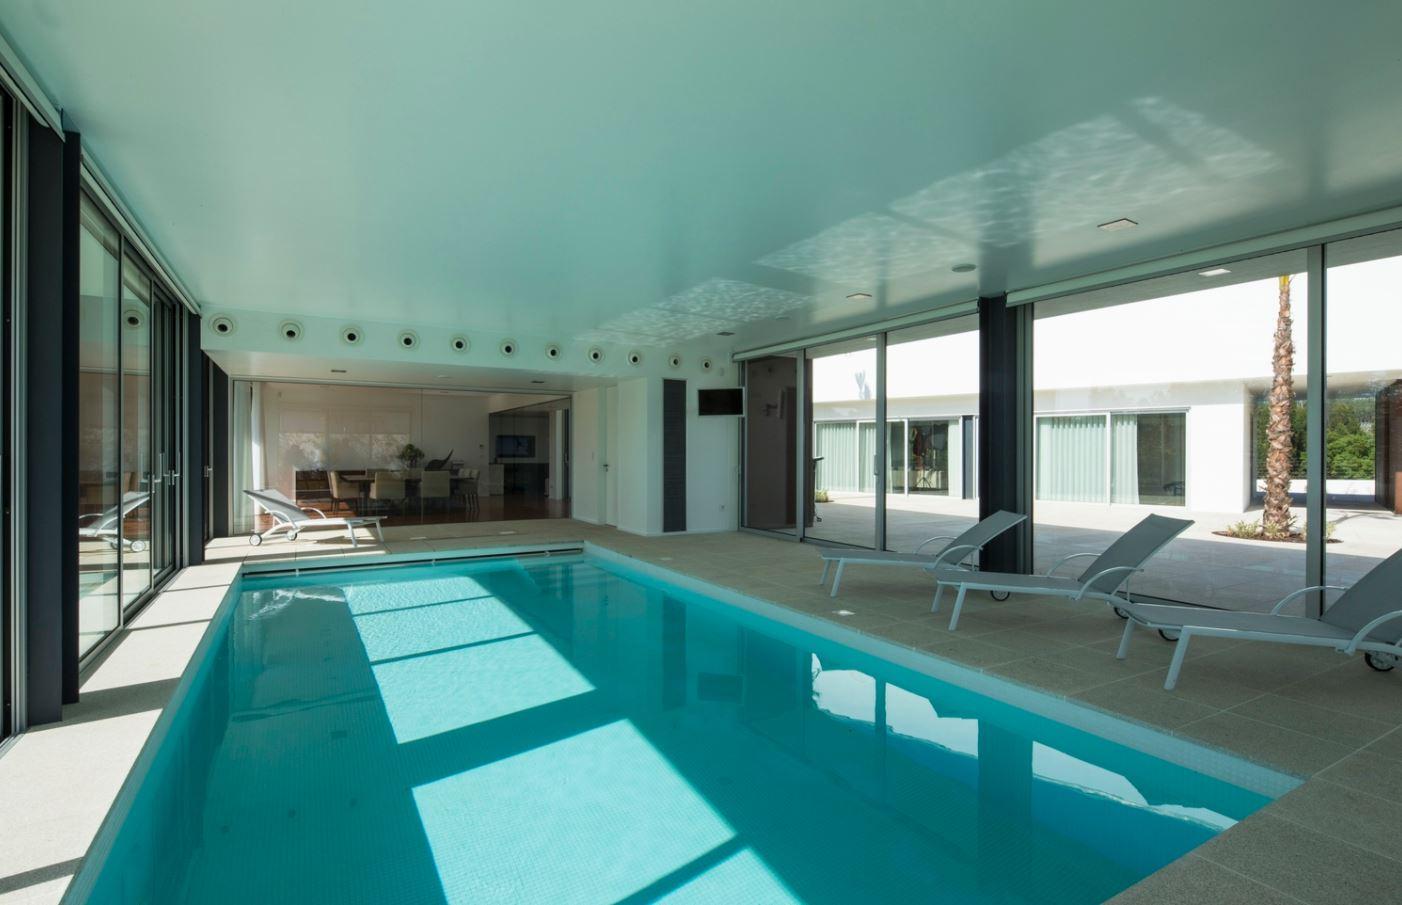 Casa con piscina interior piscina interior de la casa for Piscina interior